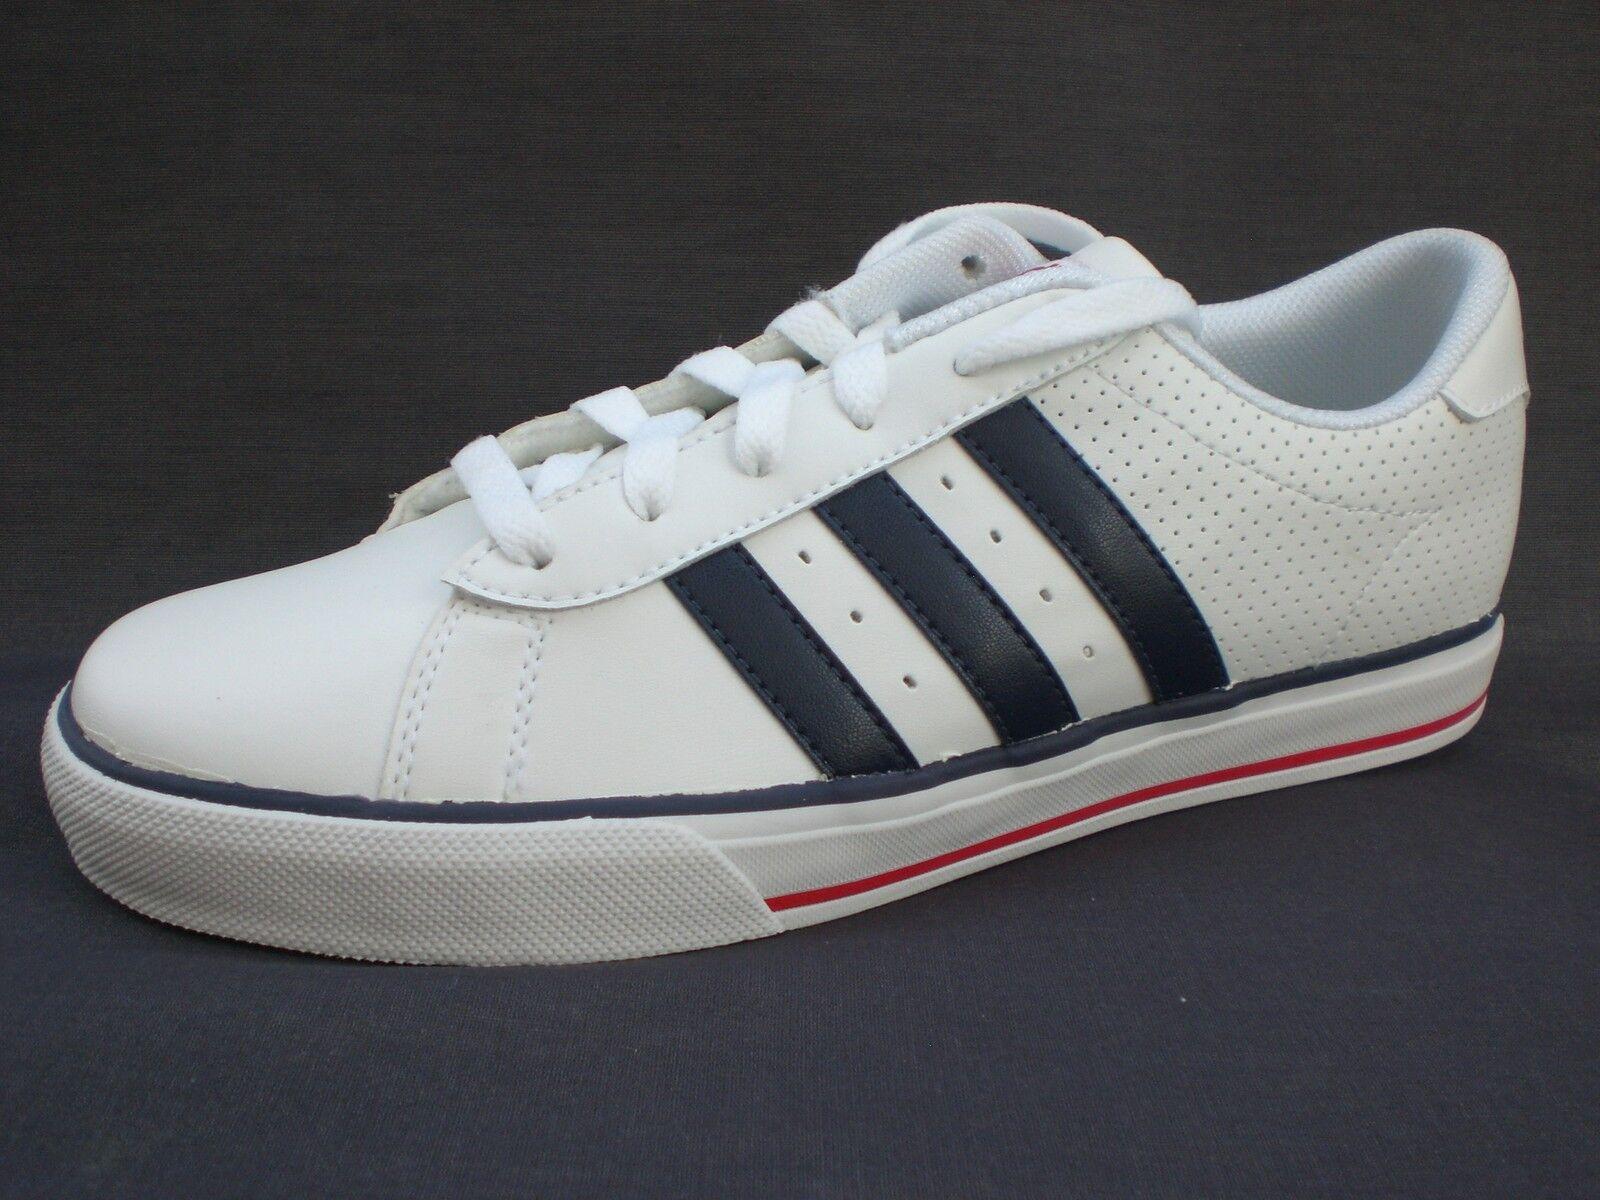 Adidas SE Daily vulc G31402 Unisex Freizeit Sneaker   Gr.40 2/3; 41 1/3; 42 Neu